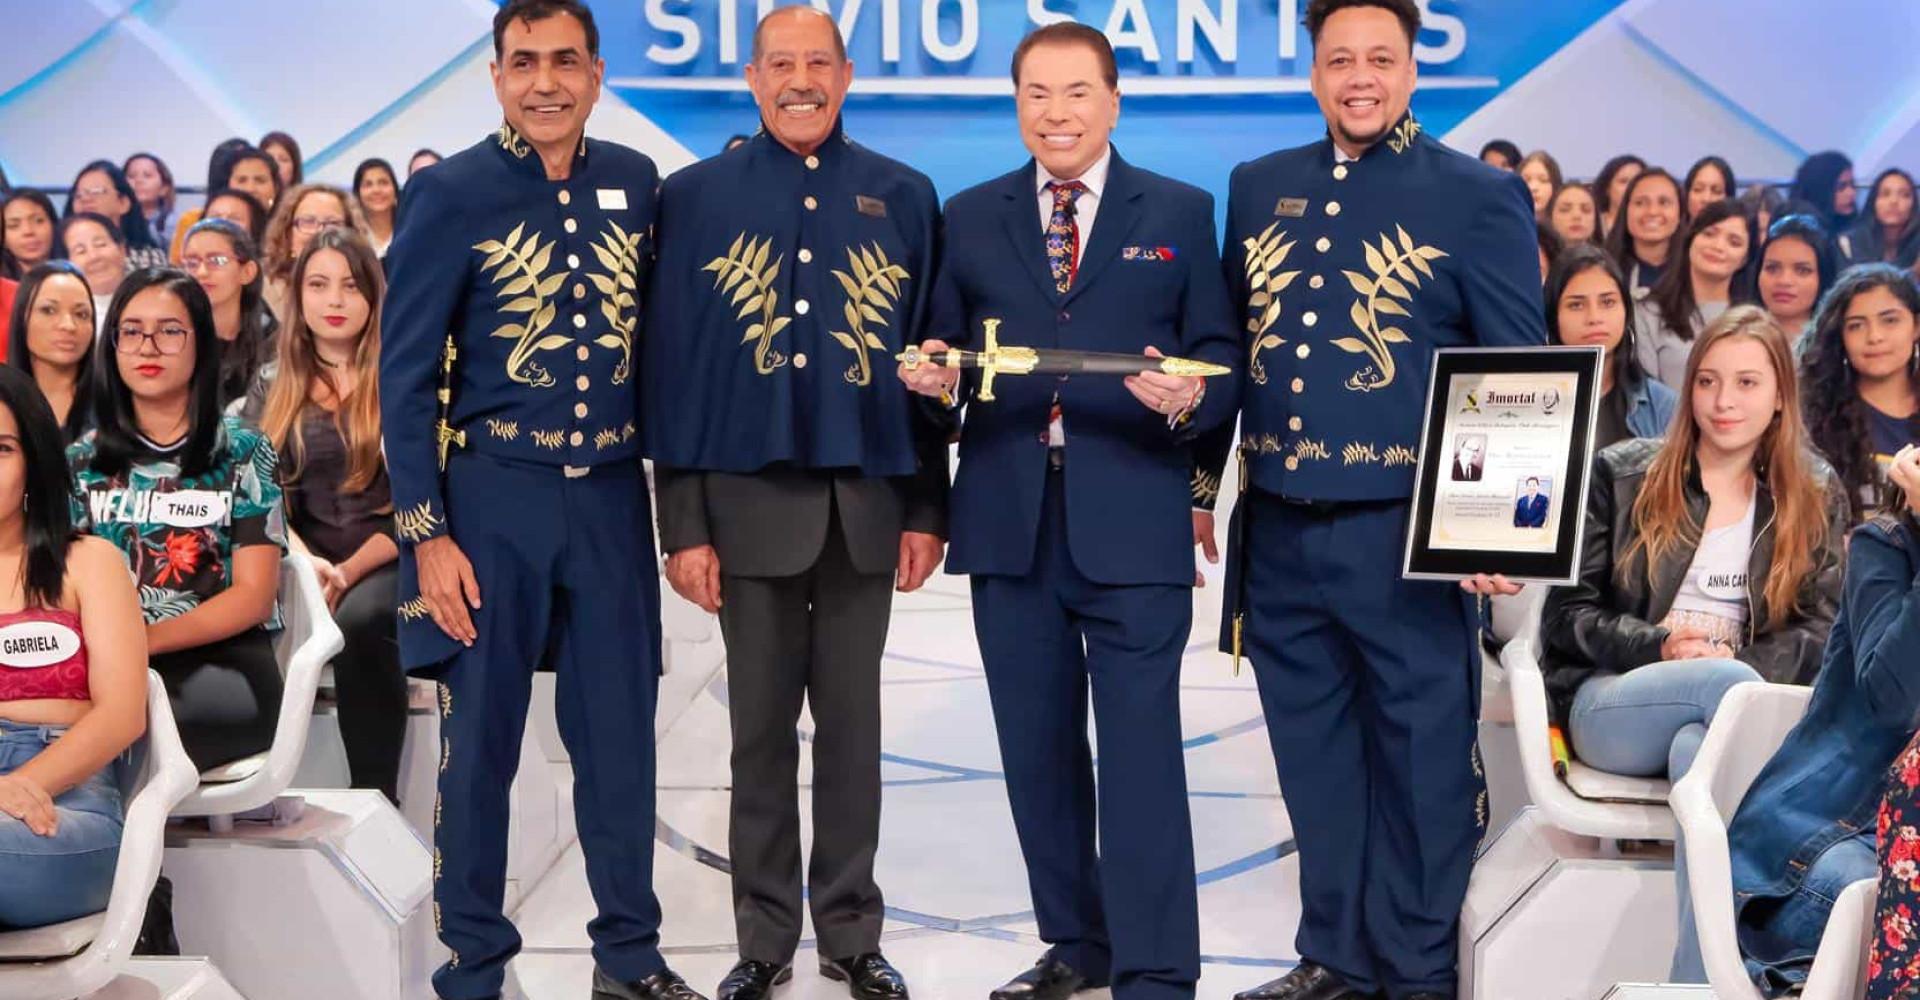 Silvio Santos recebe título de Imortal pela Academia William Shakespeare